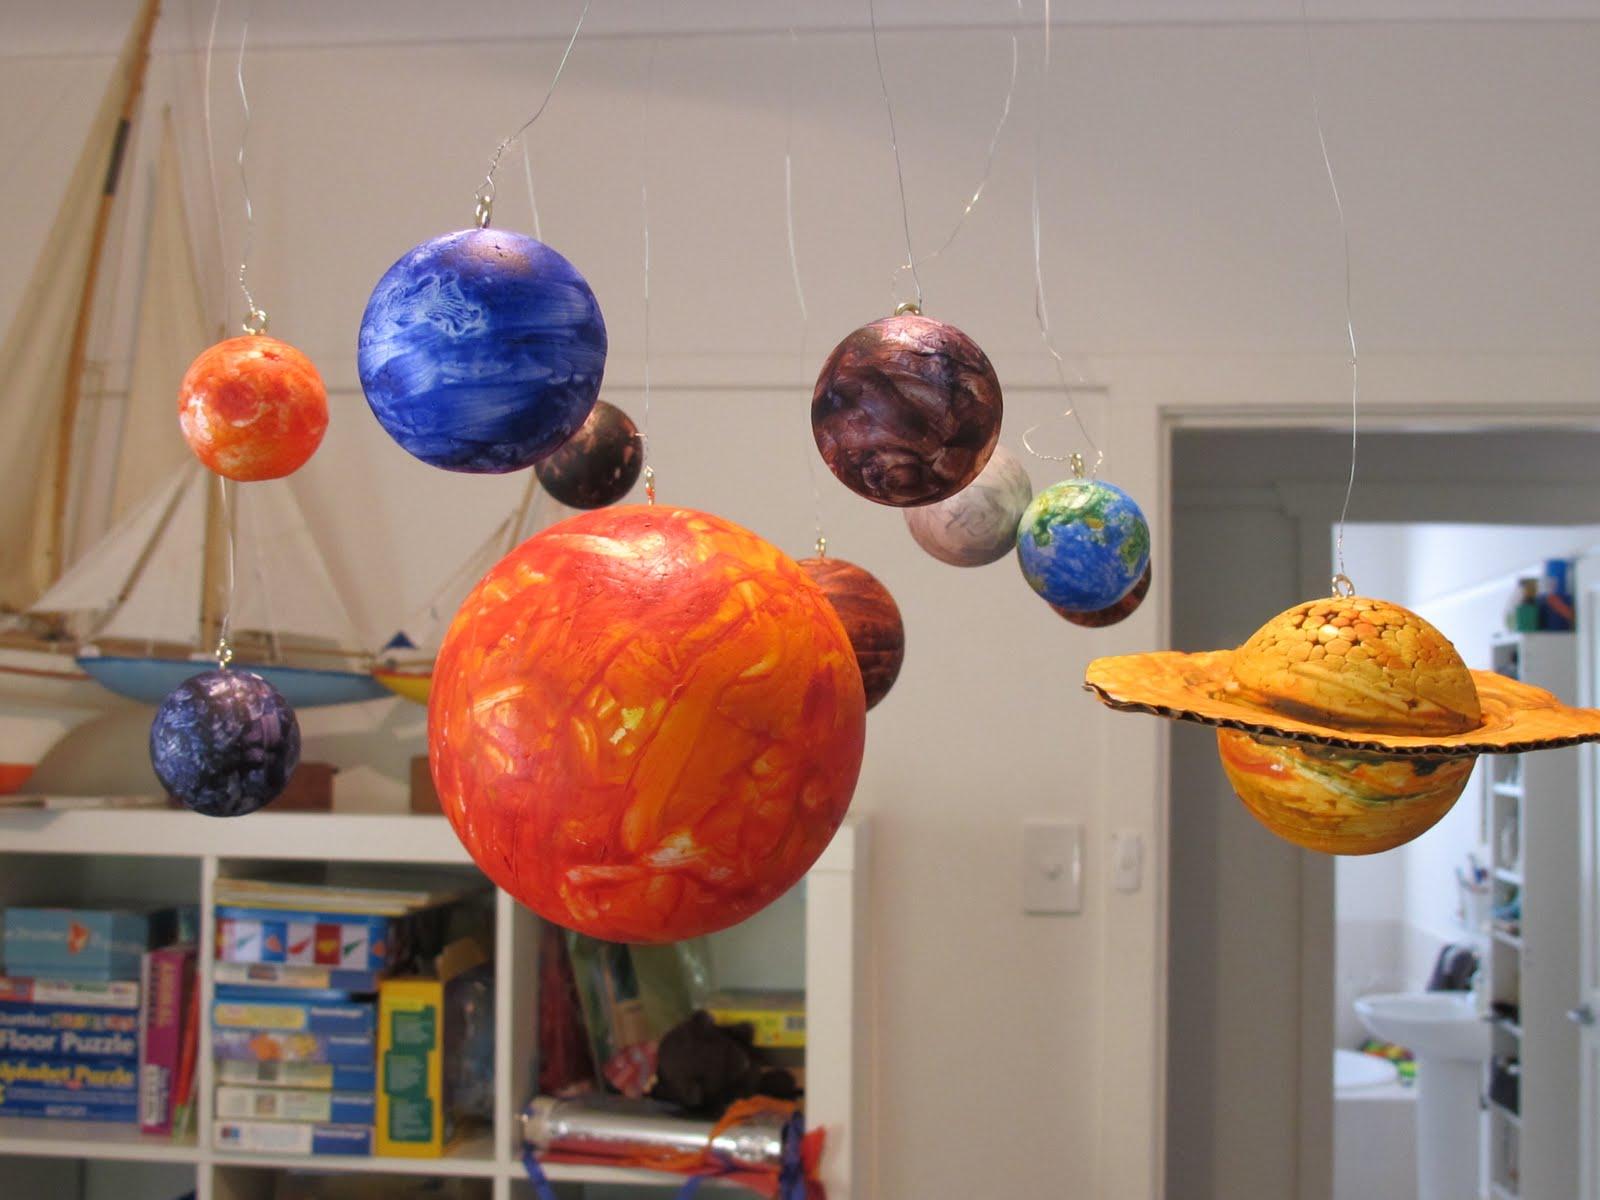 Materials: 10 styrofoam balls (1 very big for the Sun, 2 ...